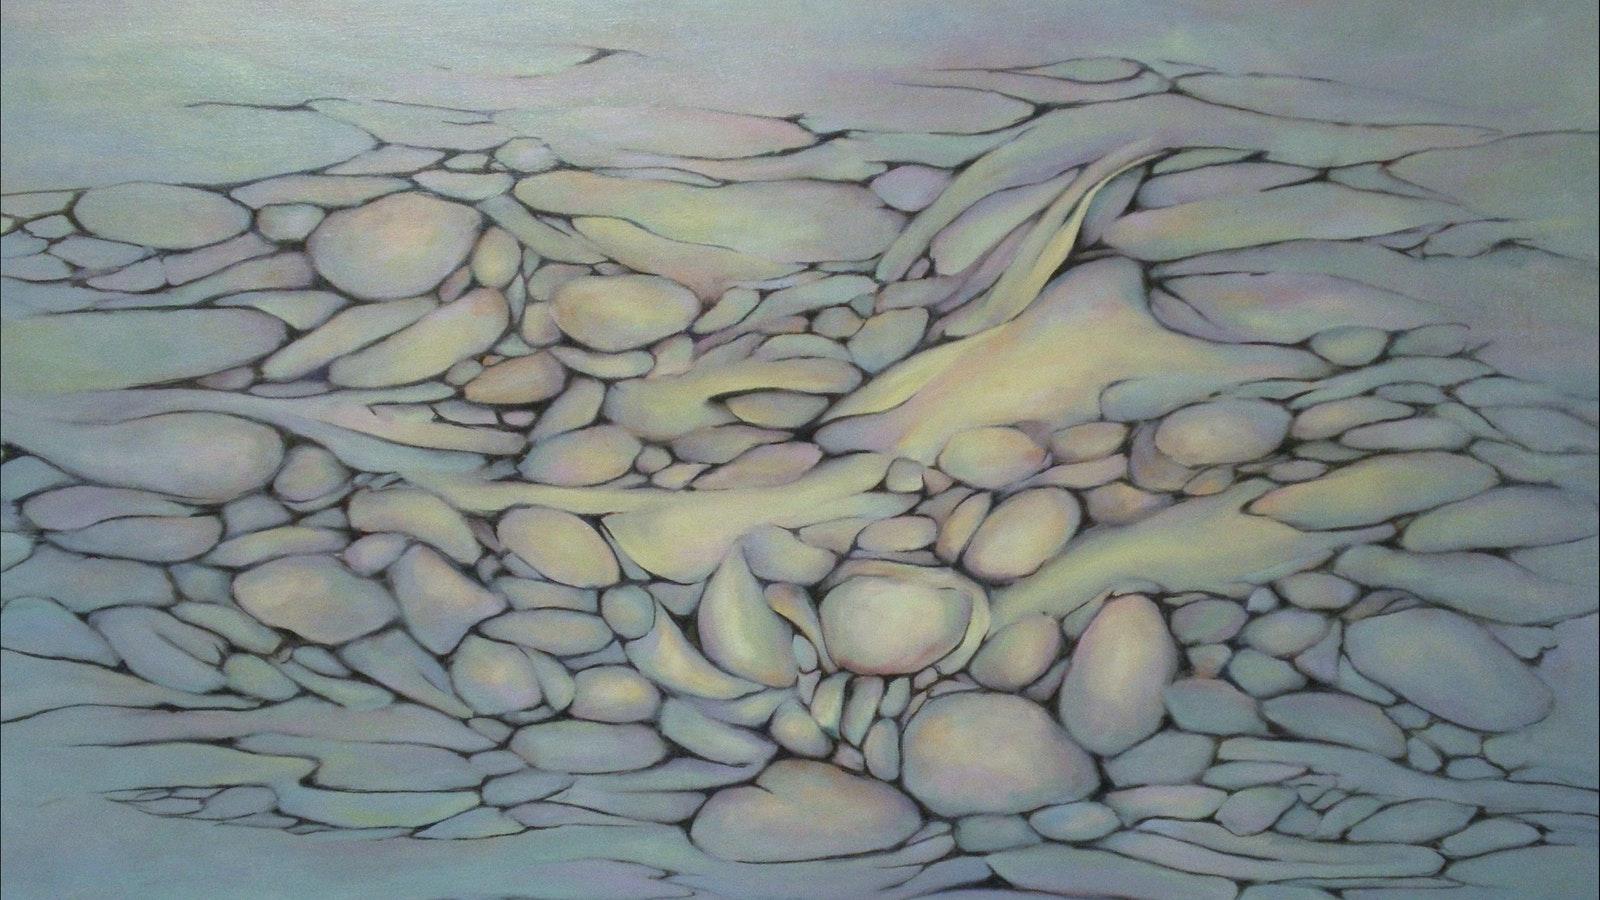 Creek Bed - Ros McArthur